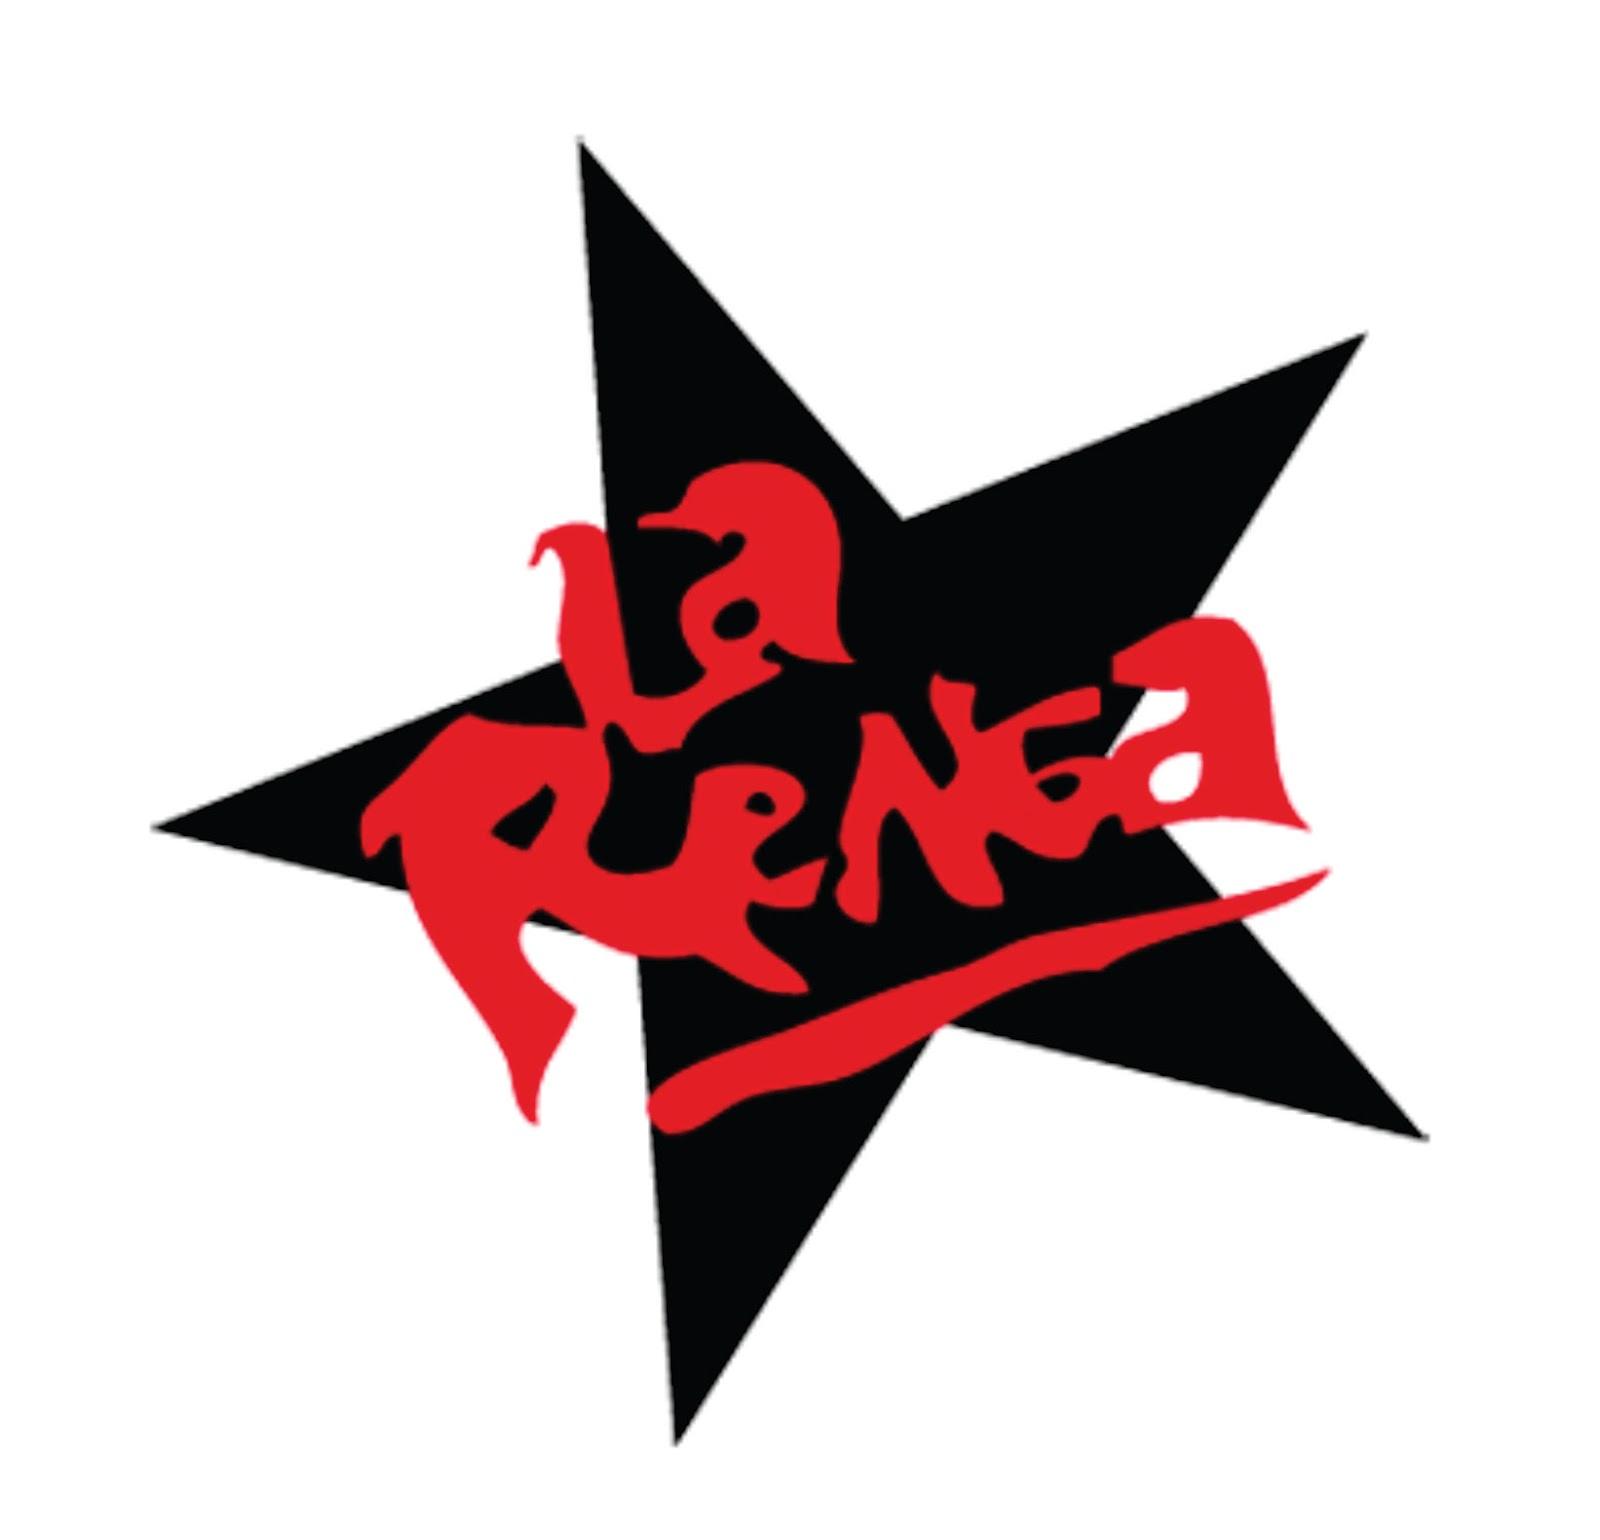 HQ La Renga Wallpapers | File 73.34Kb